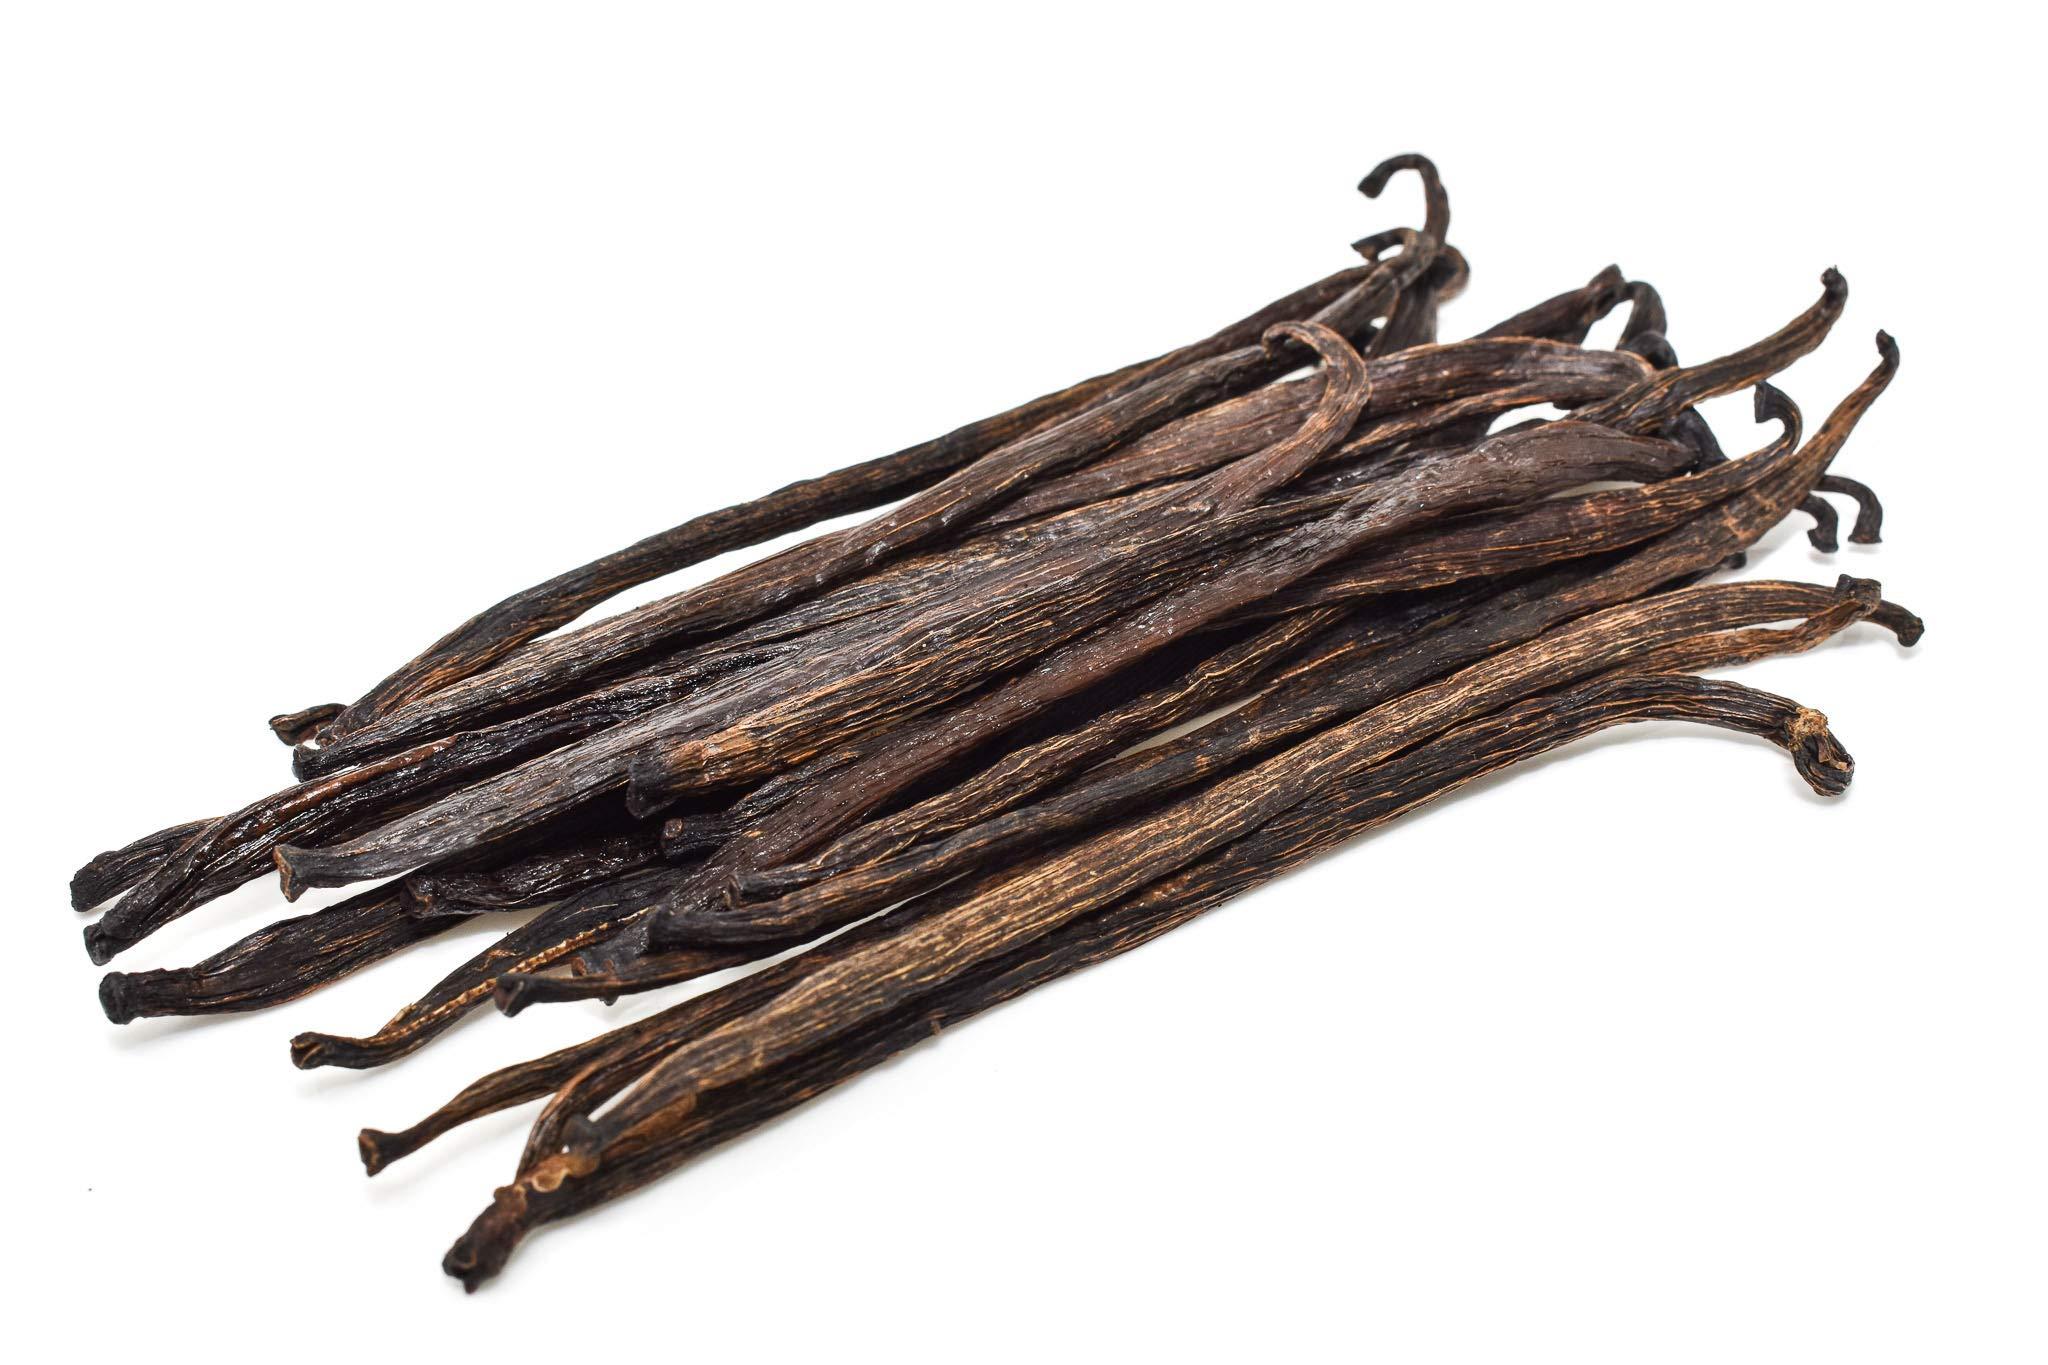 Extract Grade Vanilla Beans by Slofoodgroup 12-14 cm (various sizes available) Grade B Vanilla beans (25 extract vanilla beans)